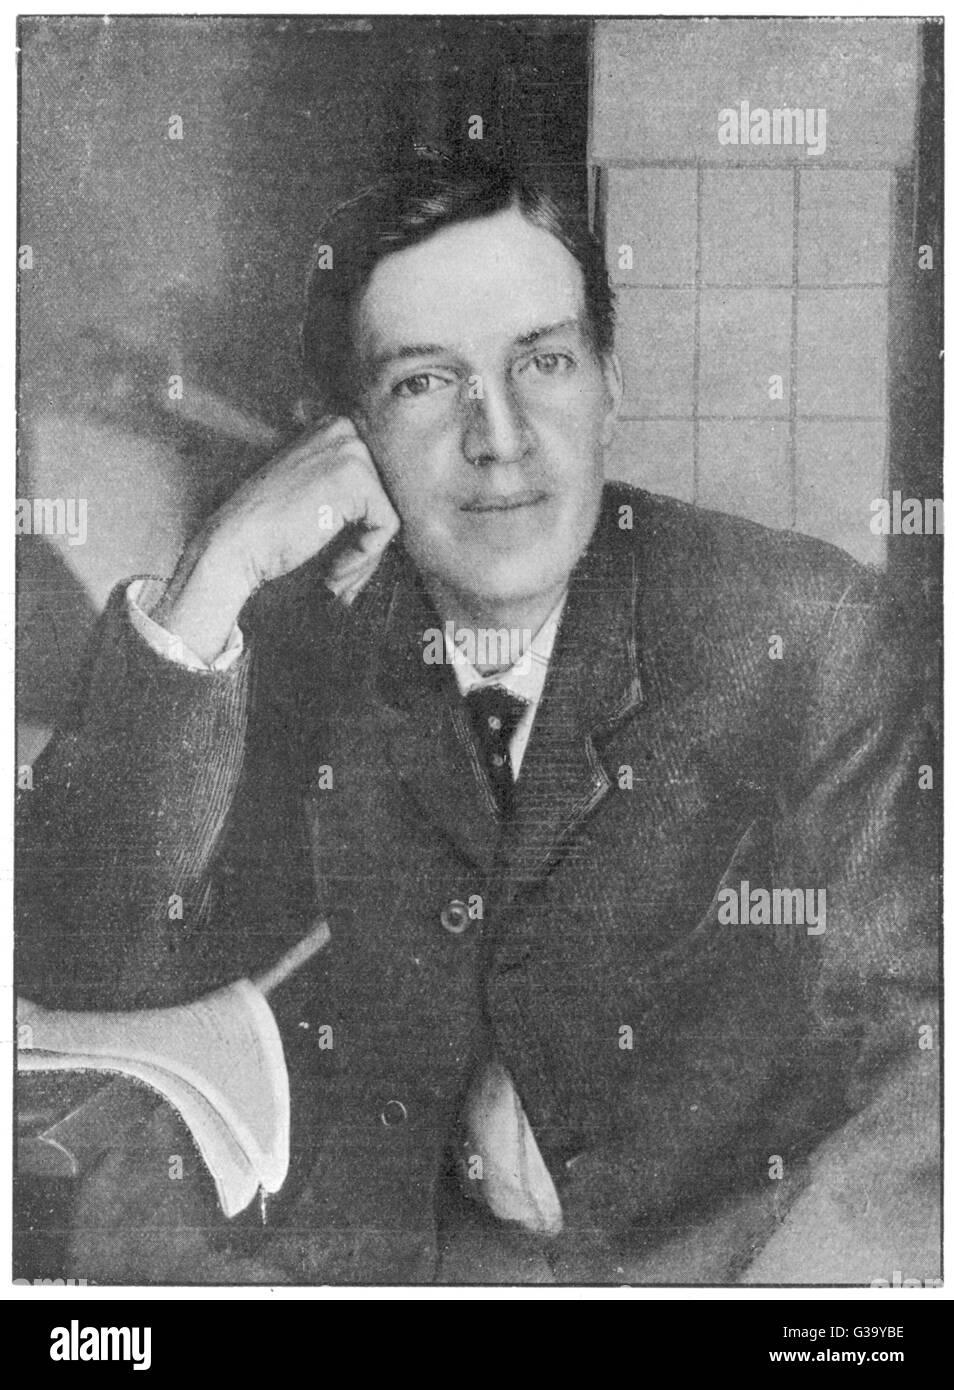 Claude Rains (1889-1967) photo